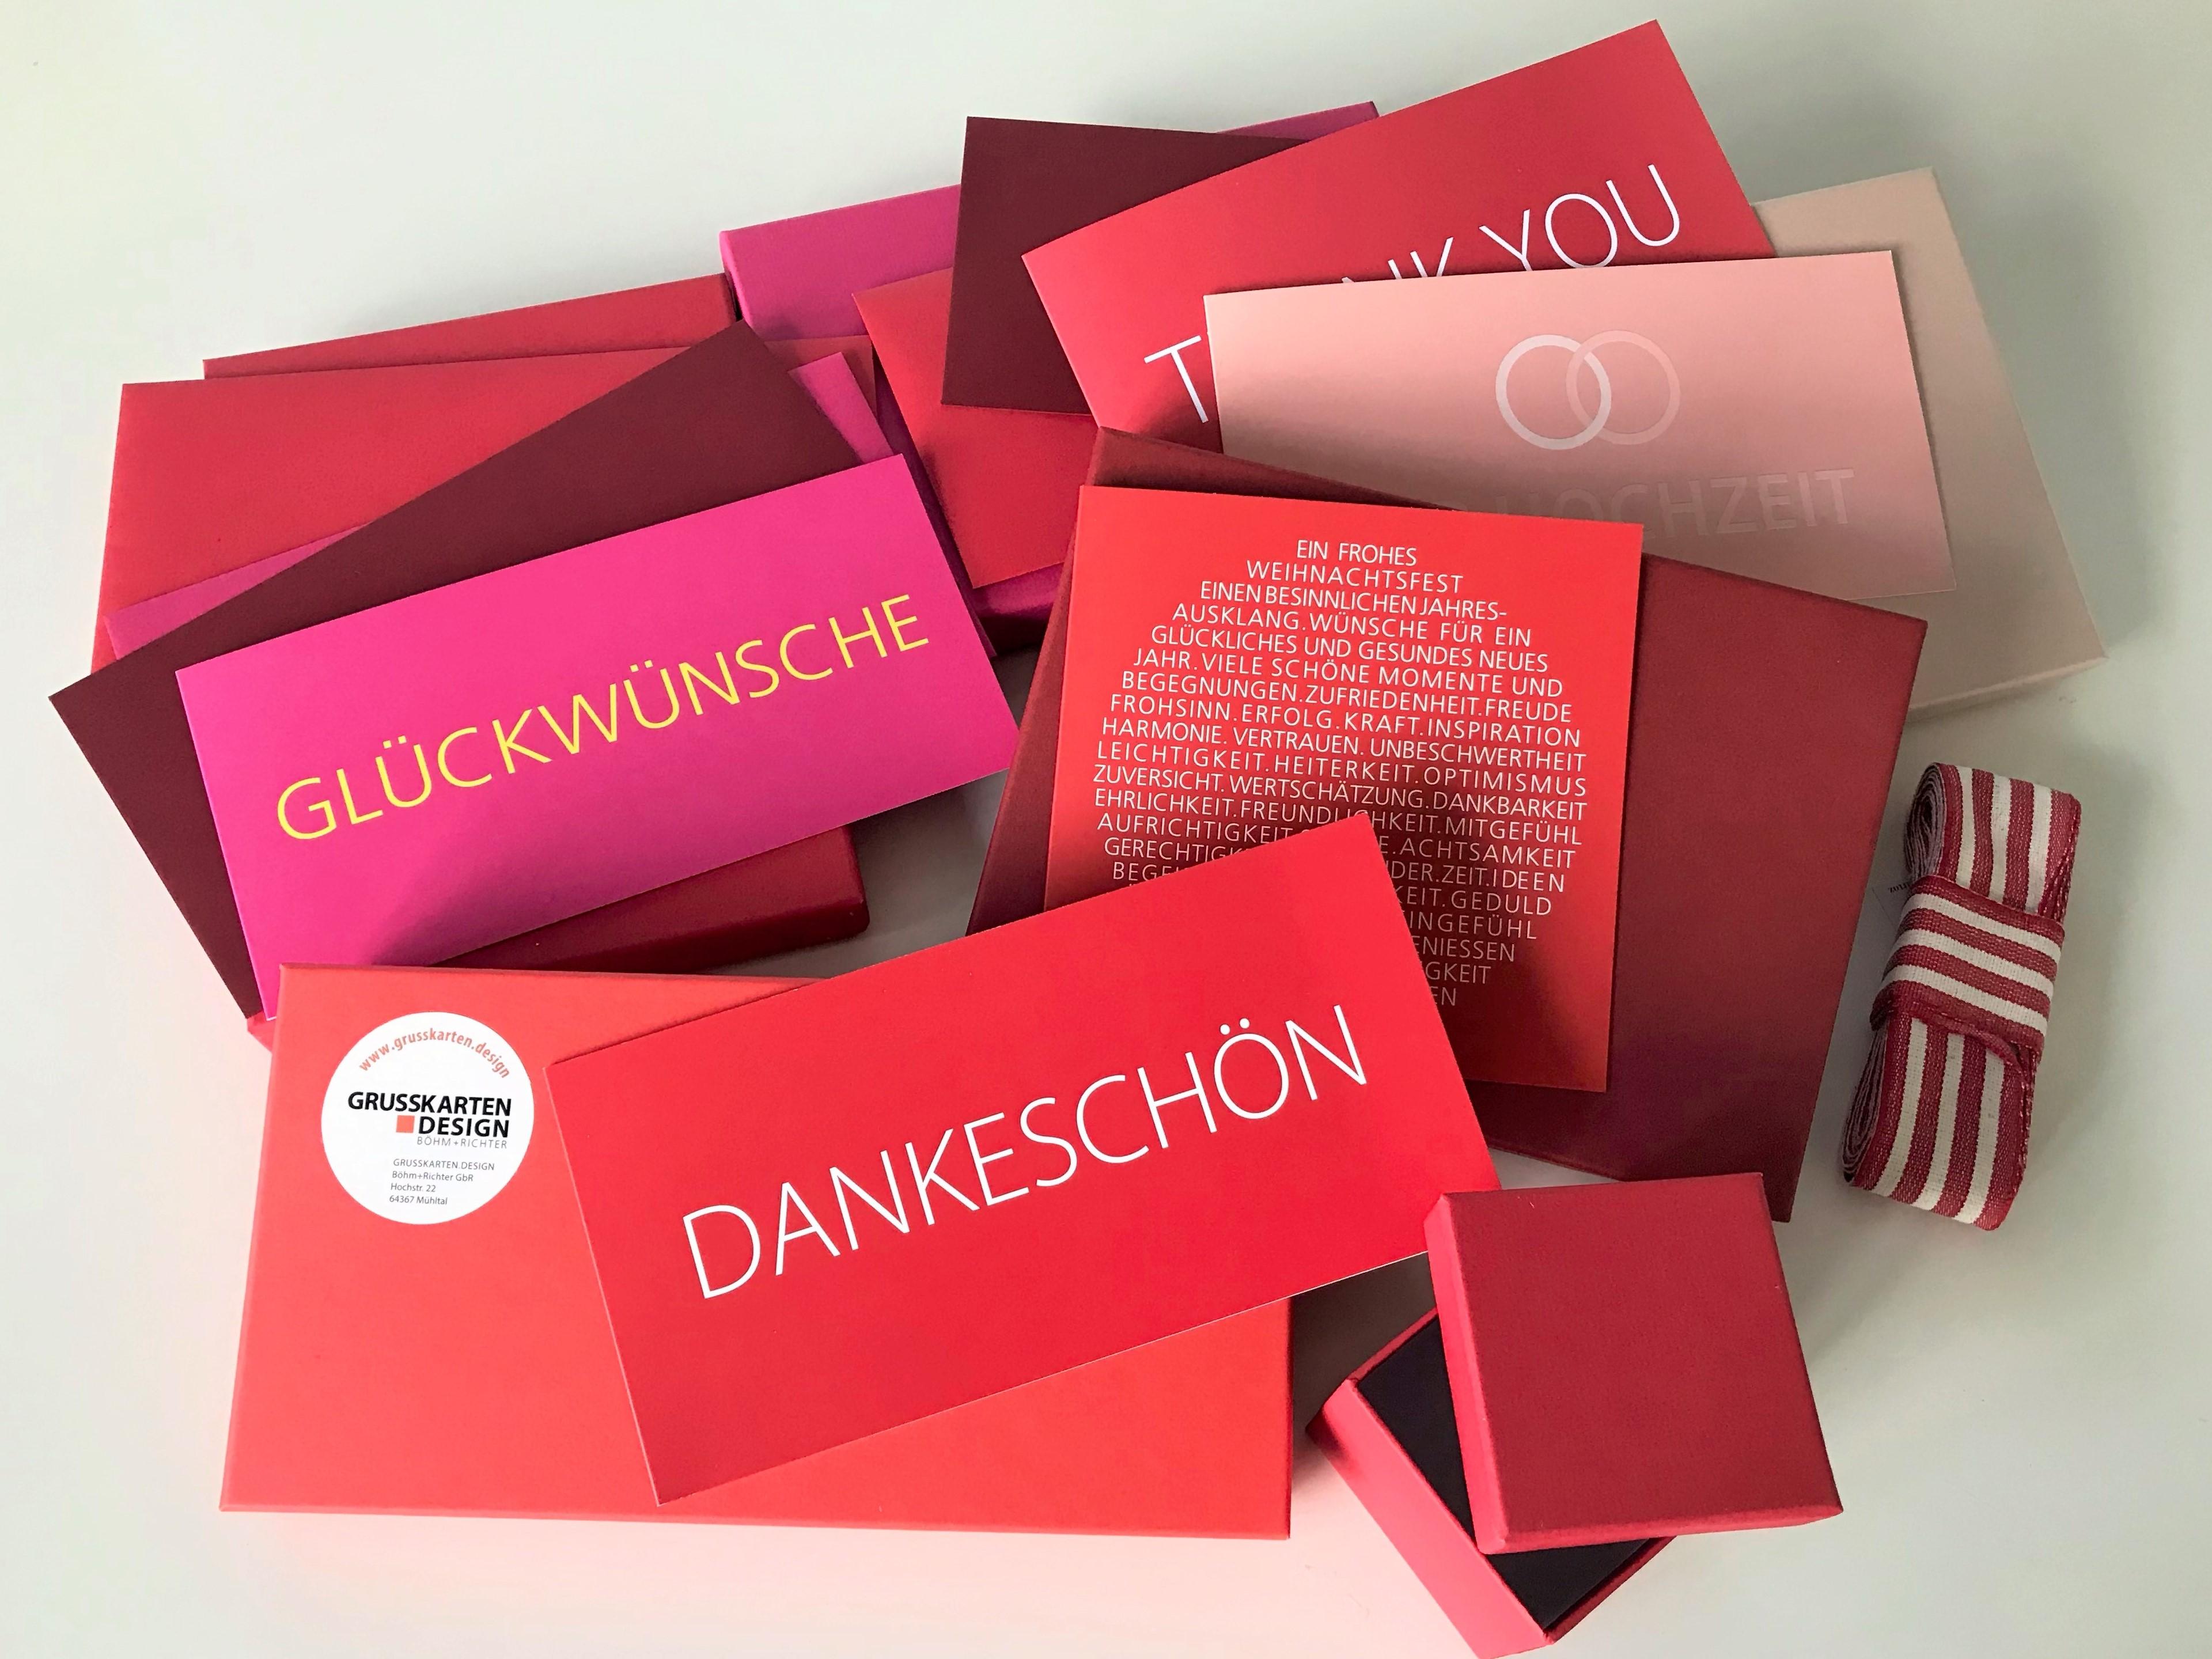 Trendfarben-herbst-winter-2021-2022_pantone_grusskarten-rot-weinrot-pink-rose